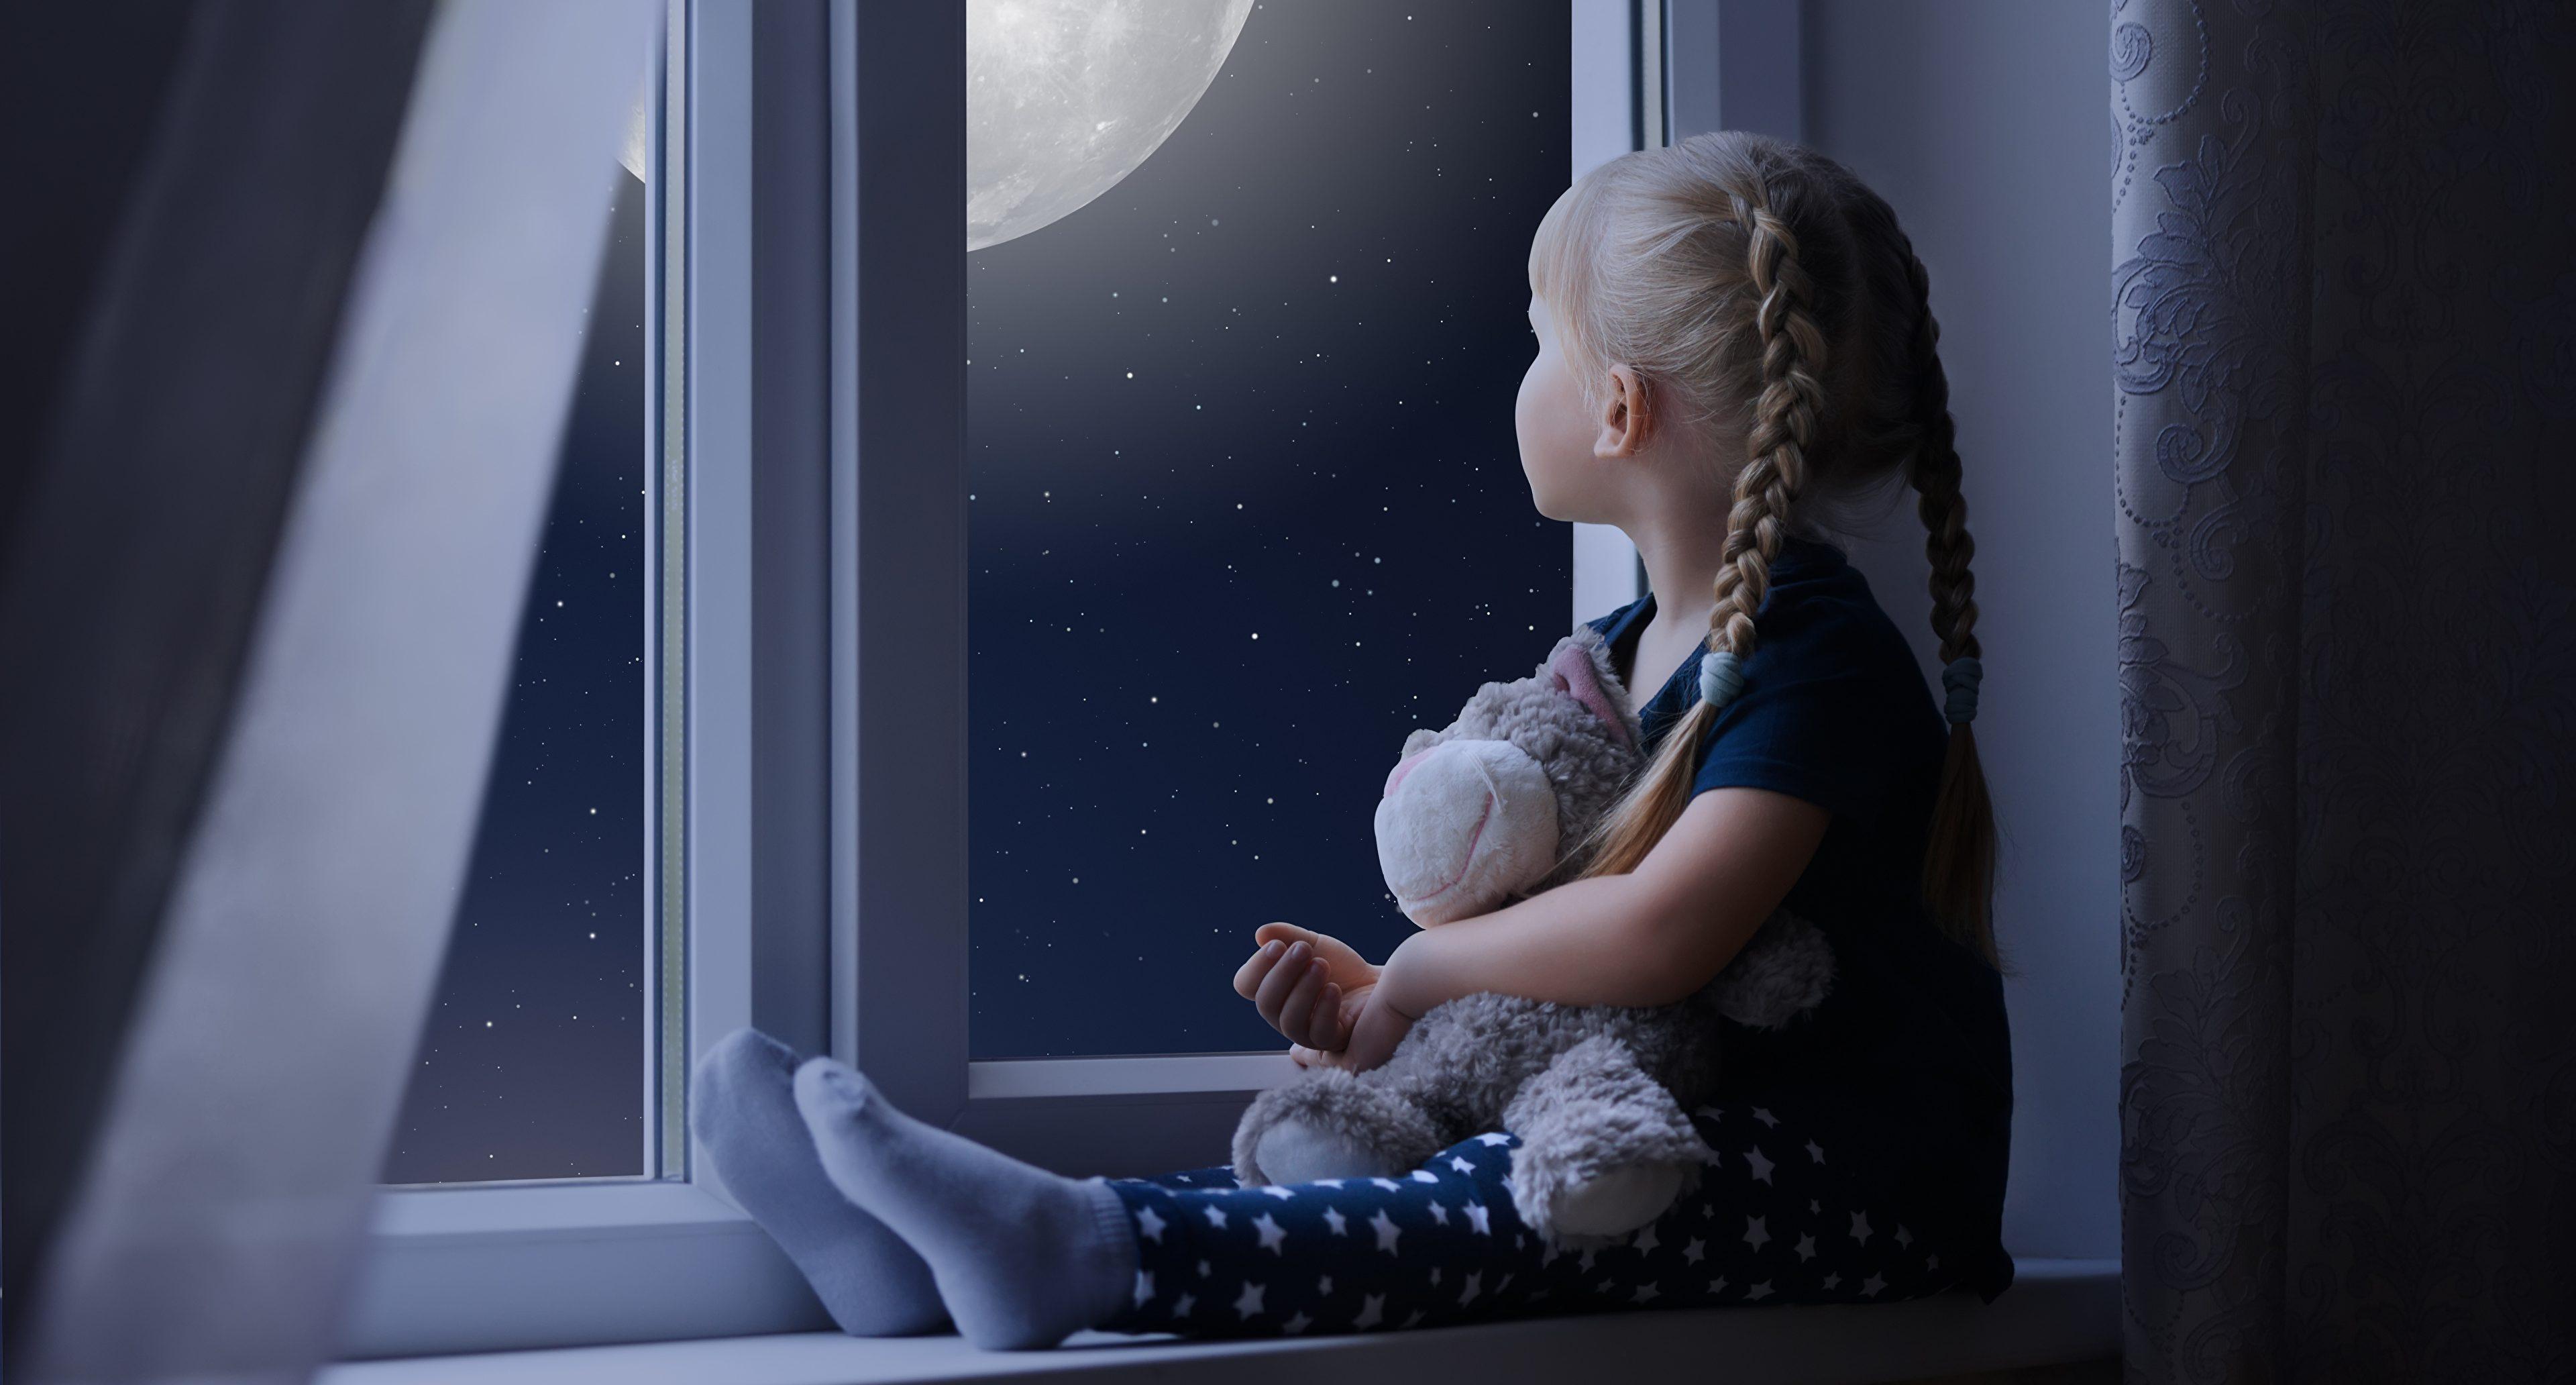 window little girls sitting night 535867 3840x2400